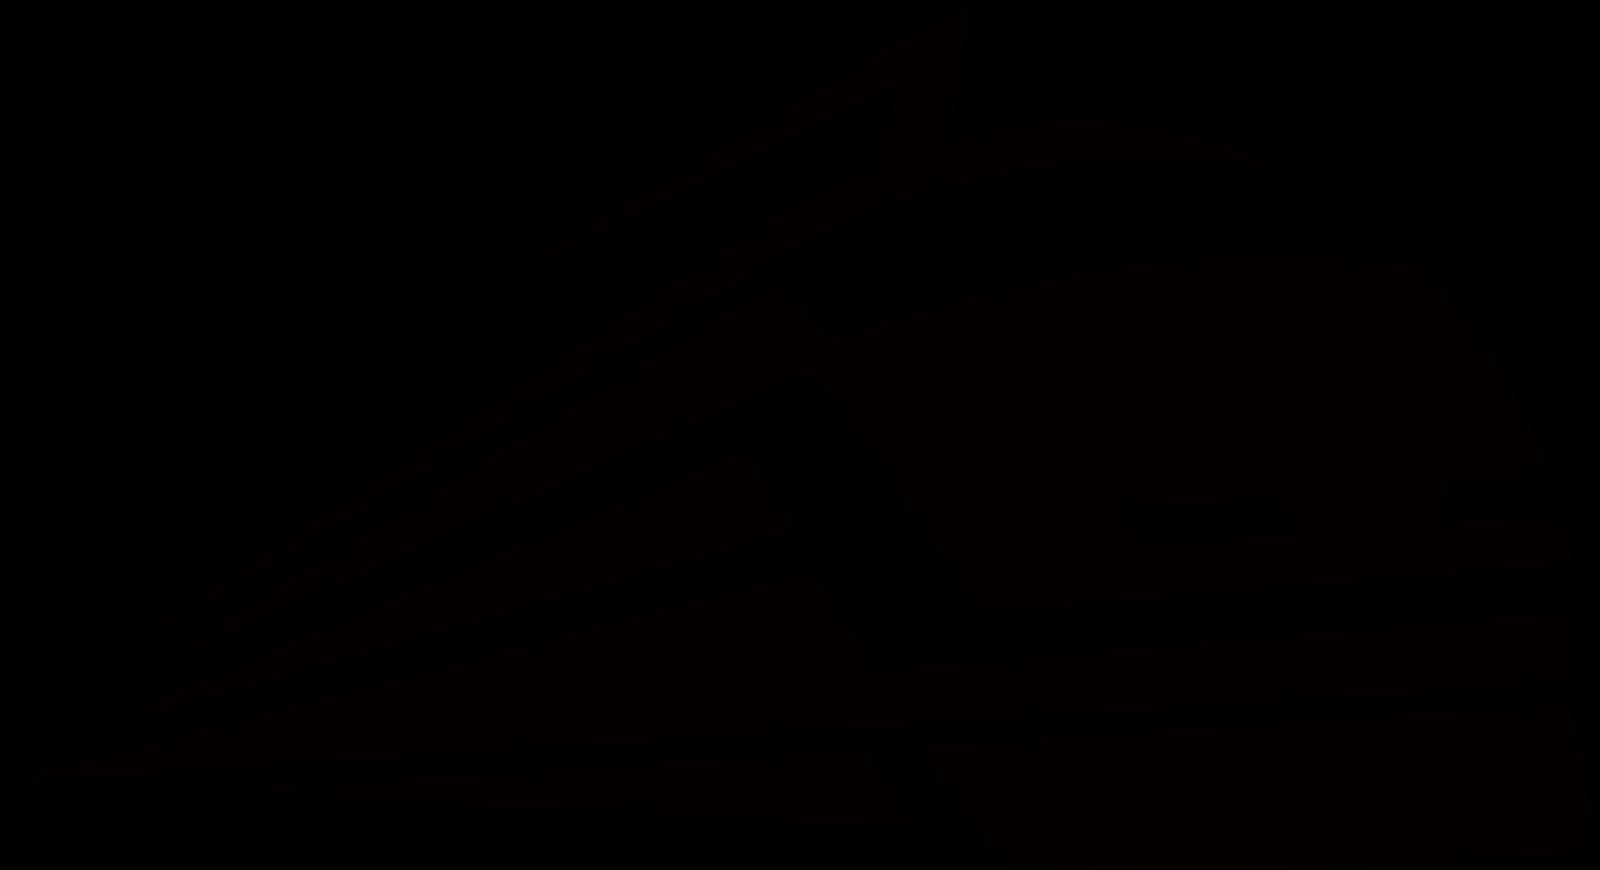 bts 背景透過 ロゴ